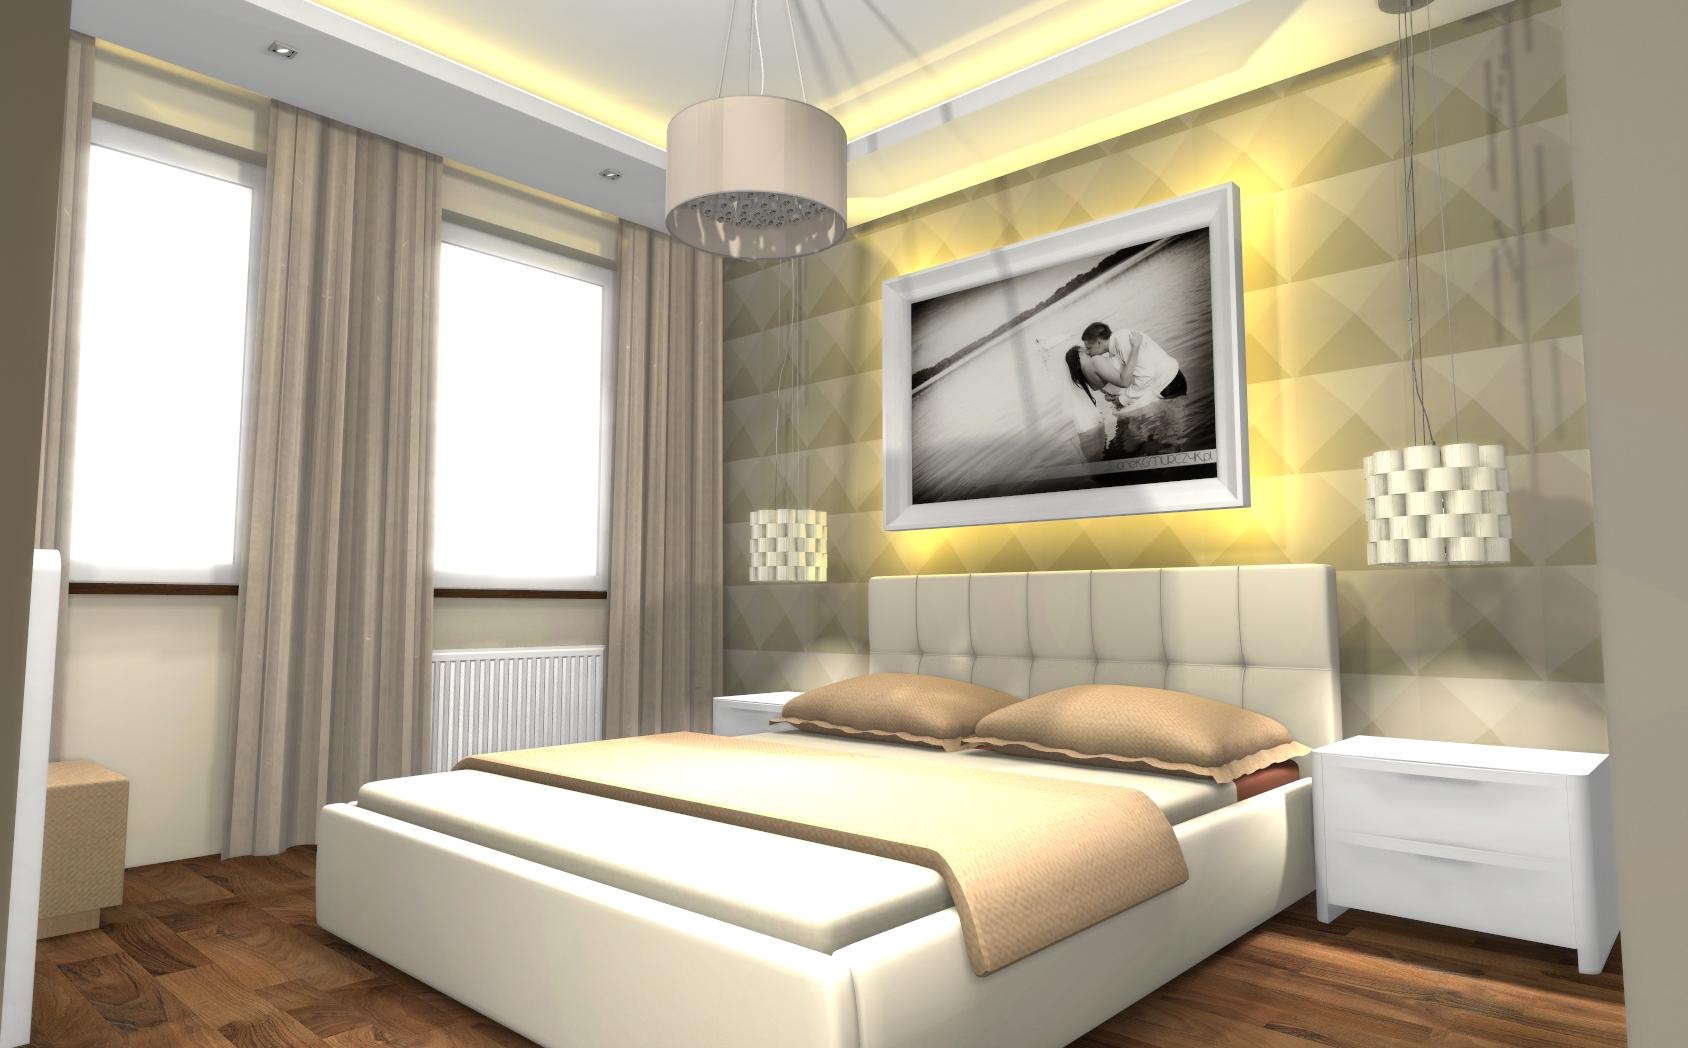 artehaus projektowanie wn trz na odleg os online projekty sypialni. Black Bedroom Furniture Sets. Home Design Ideas